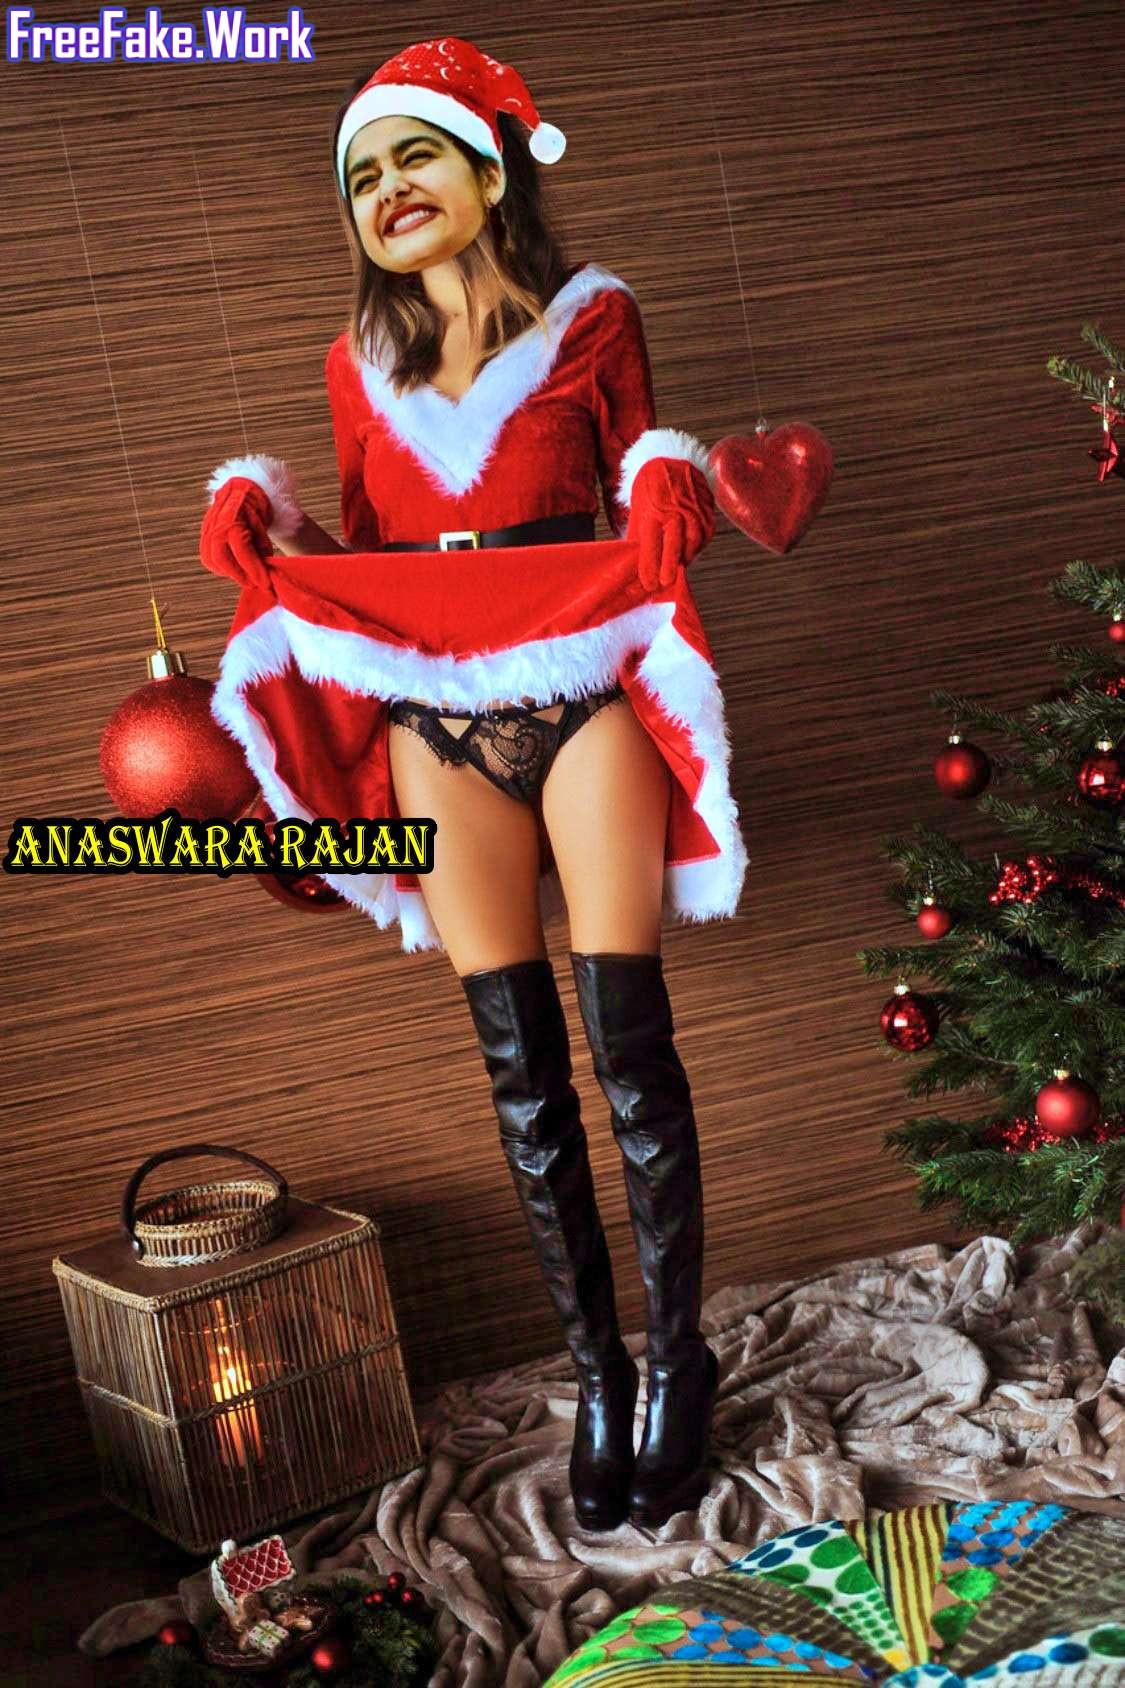 Anaswara-Rajan-removing-her-Christmas-special-dress.jpg